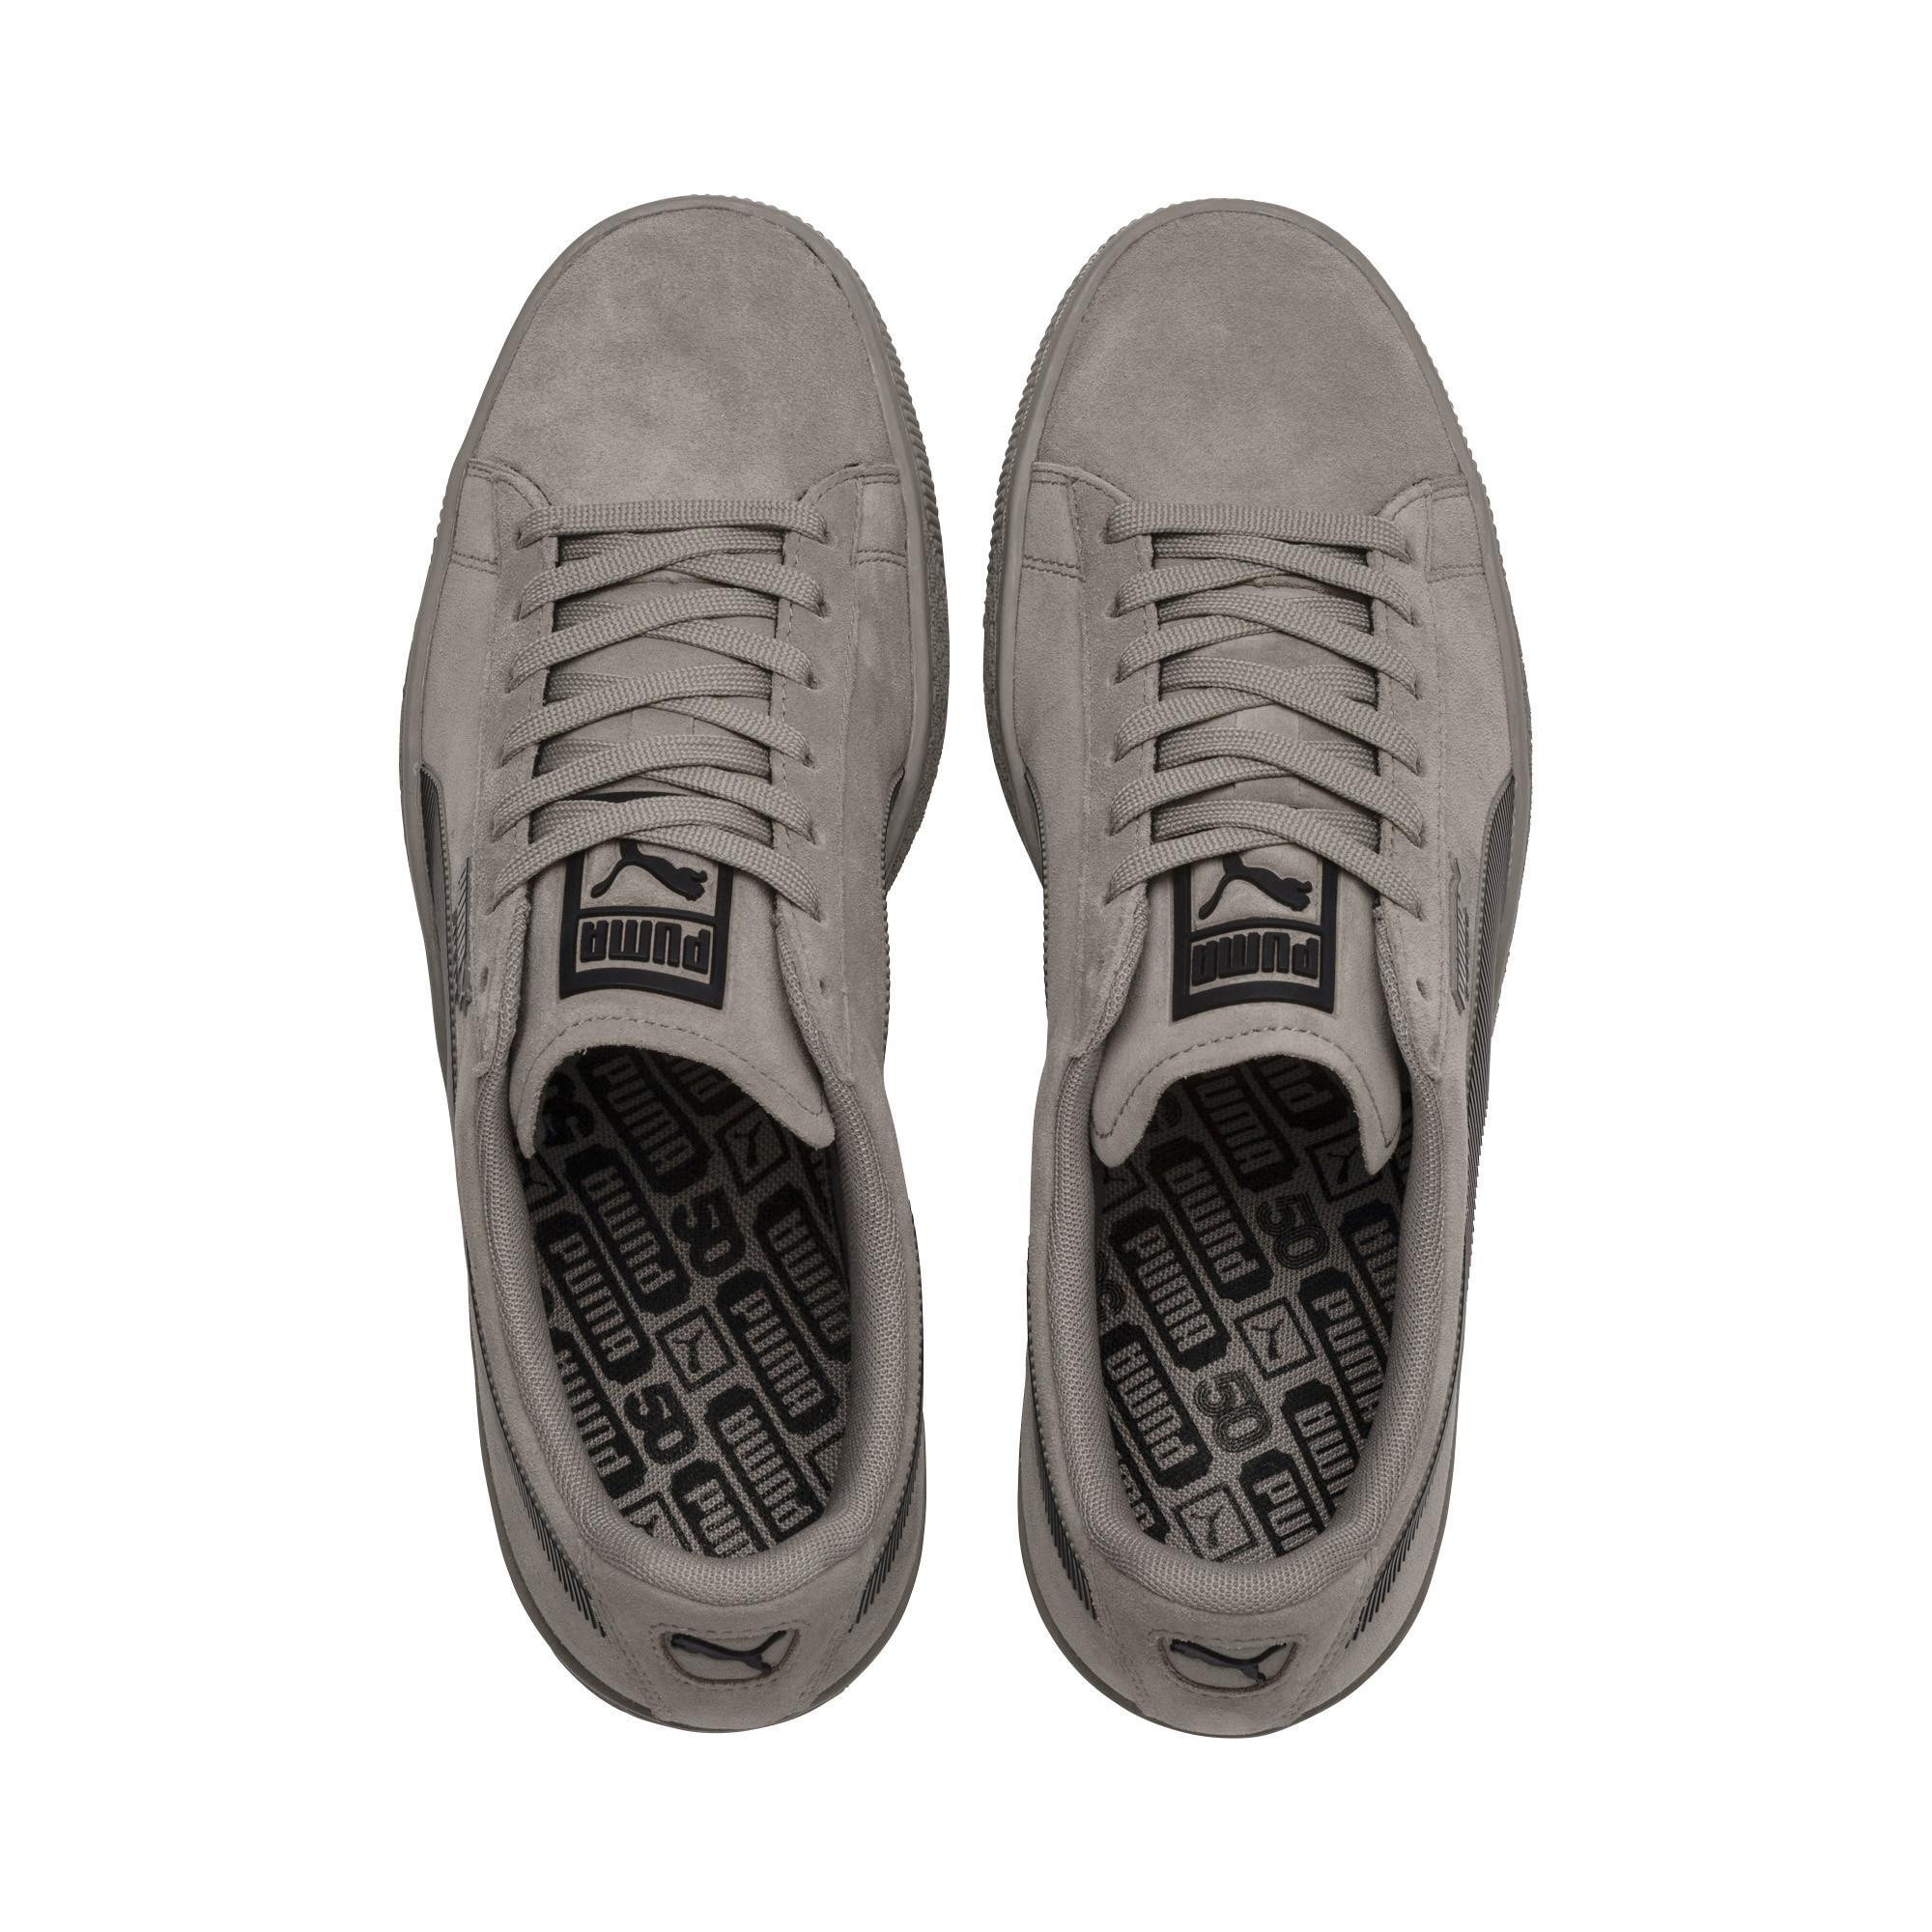 PUMA Suede Classic Kurim Sneakers for